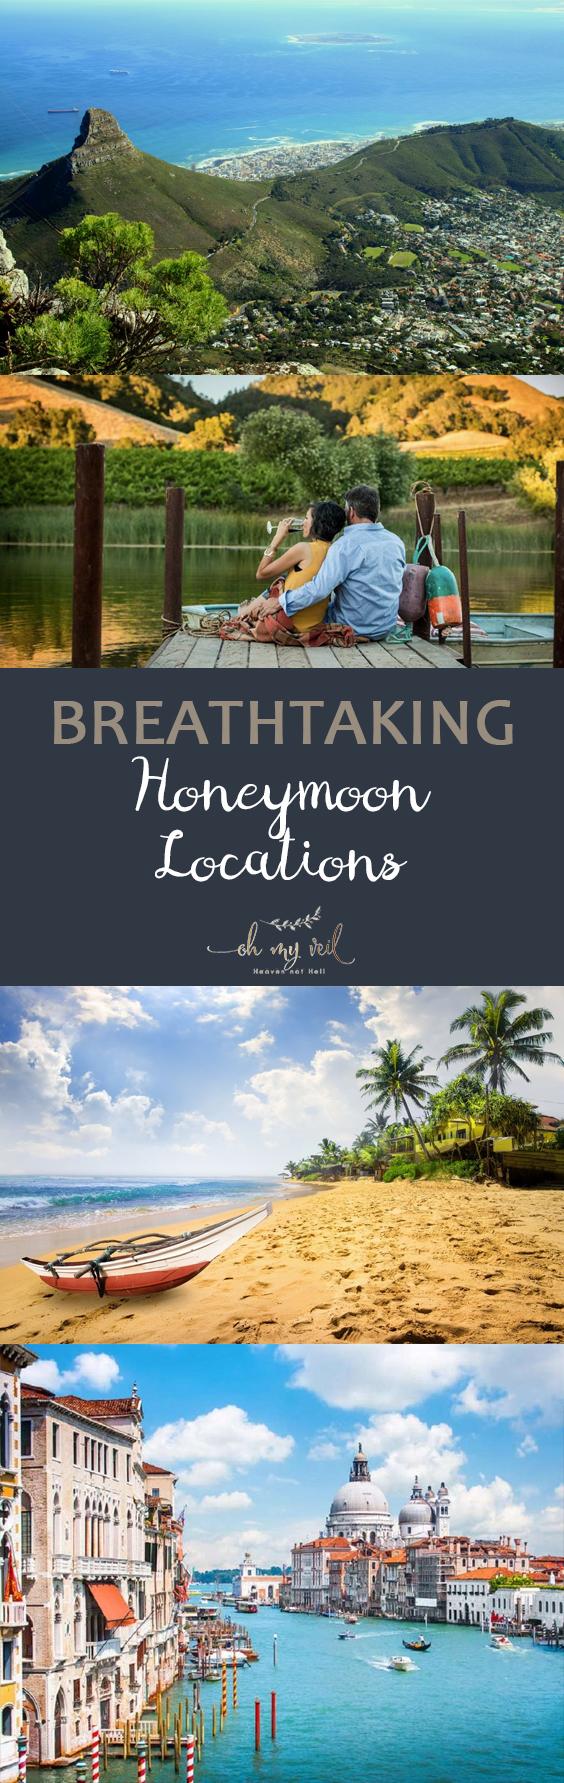 Breathtaking Honeymoon Locations  Honeymoon Locations, Fun Honeymoon Locations, How to Plan Your Honeymoon, Wedding, Honeymoon 101, Honeymoon Planning TIps and Tricks, Honeymoon Travel Tips, Popular Pin